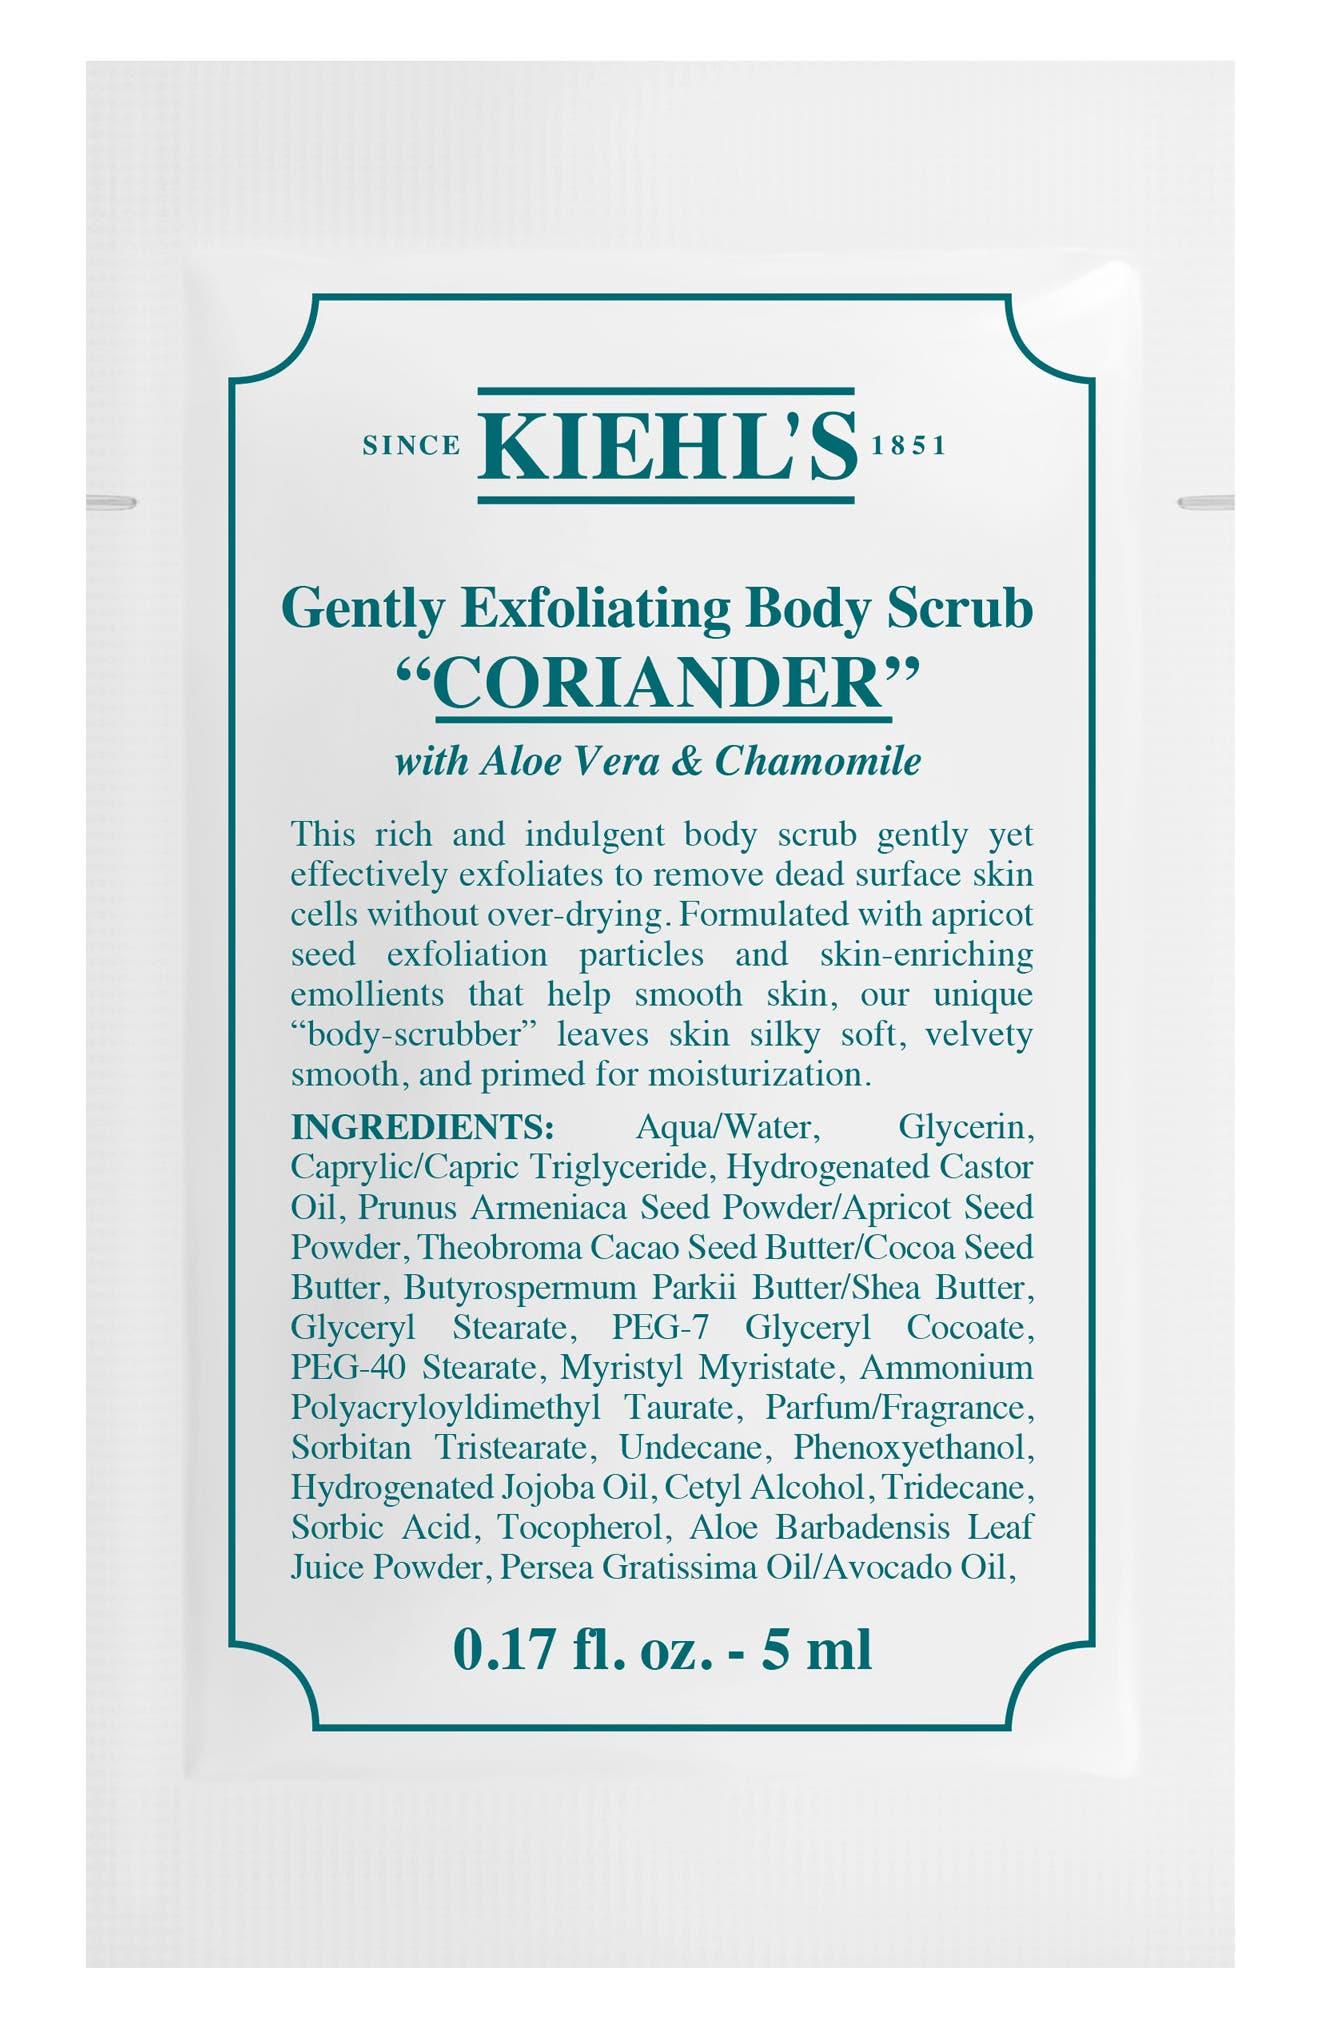 KIEHL'S SINCE 1851, Gentle Exfoliating Body Scrub, Alternate thumbnail 3, color, CORIANDER